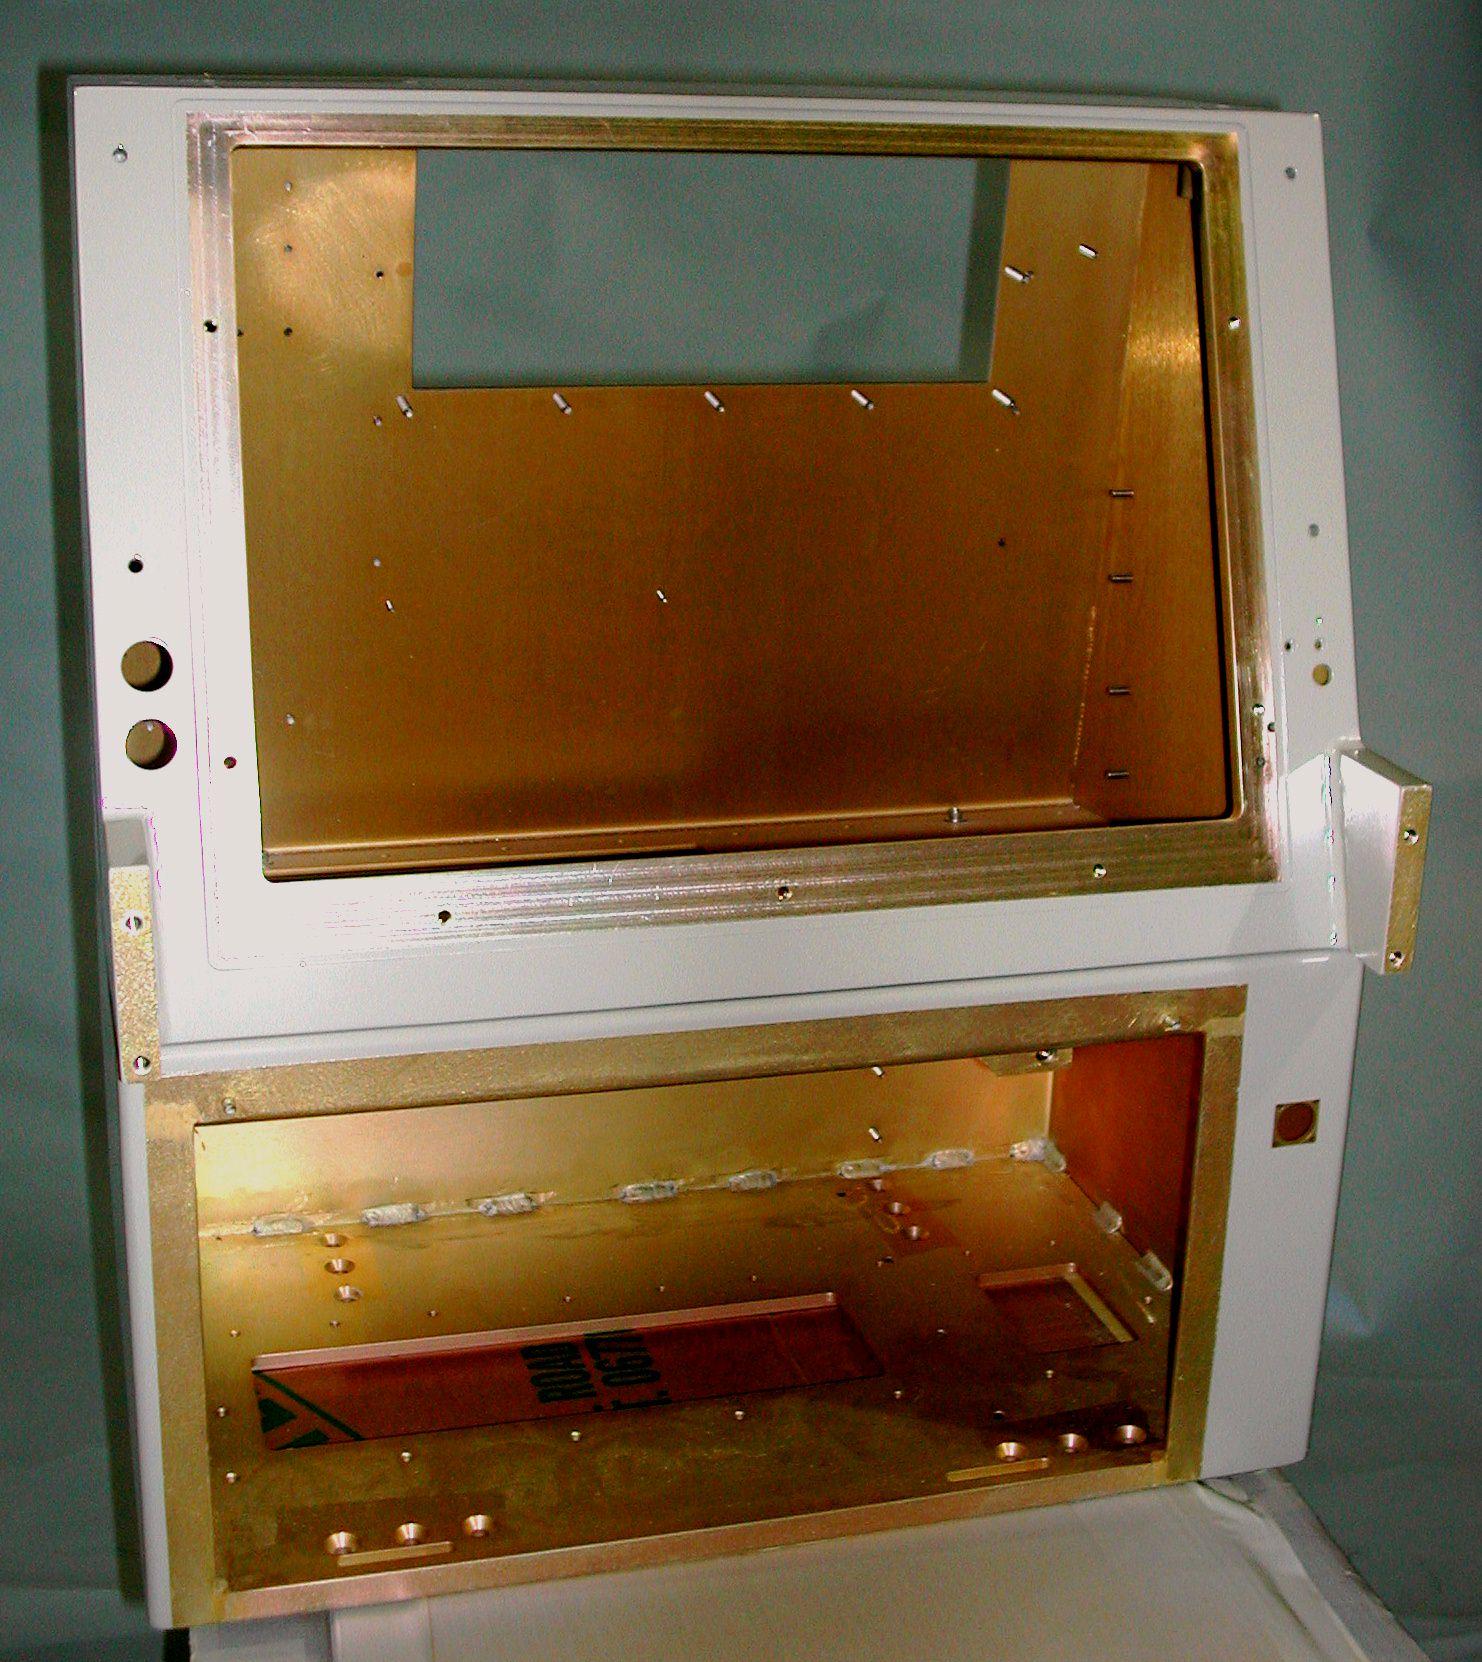 Metal Enclosures Millitary Hopewell Precision NY DSCN1531.jpg